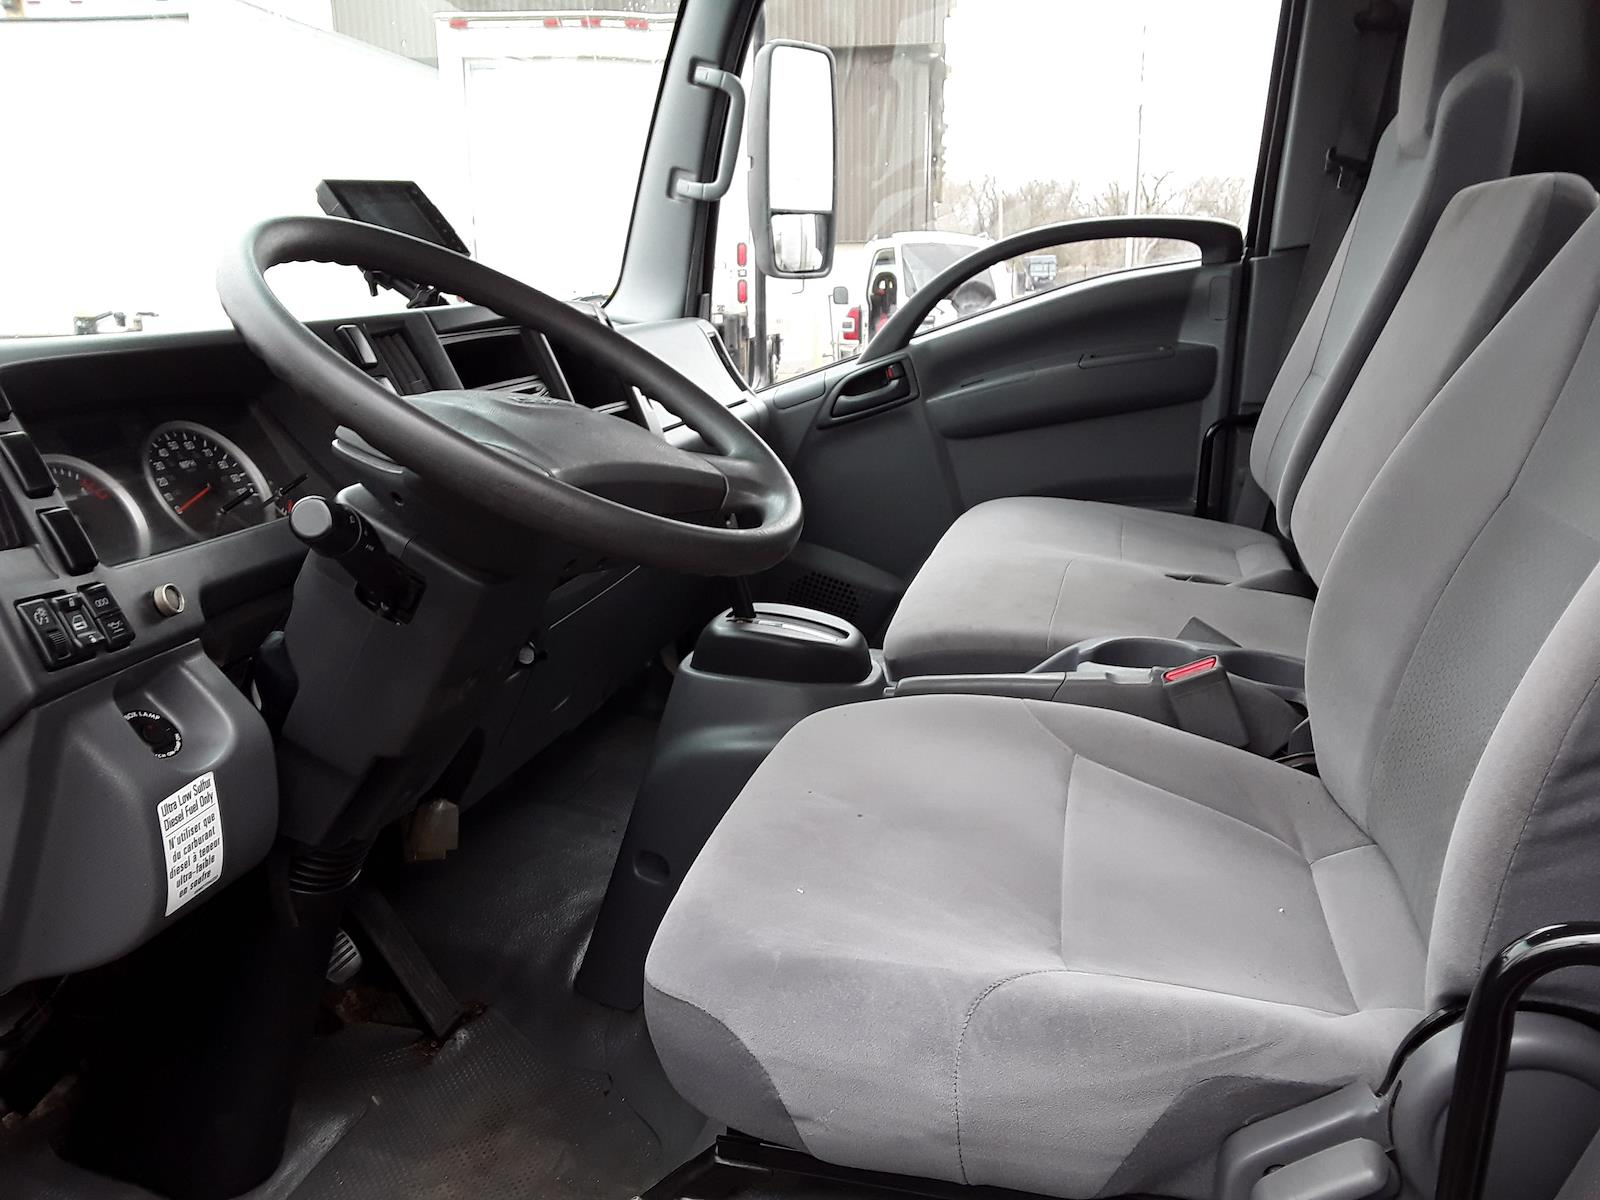 2016 Isuzu NPR Regular Cab 4x2, Dry Freight #683133 - photo 8